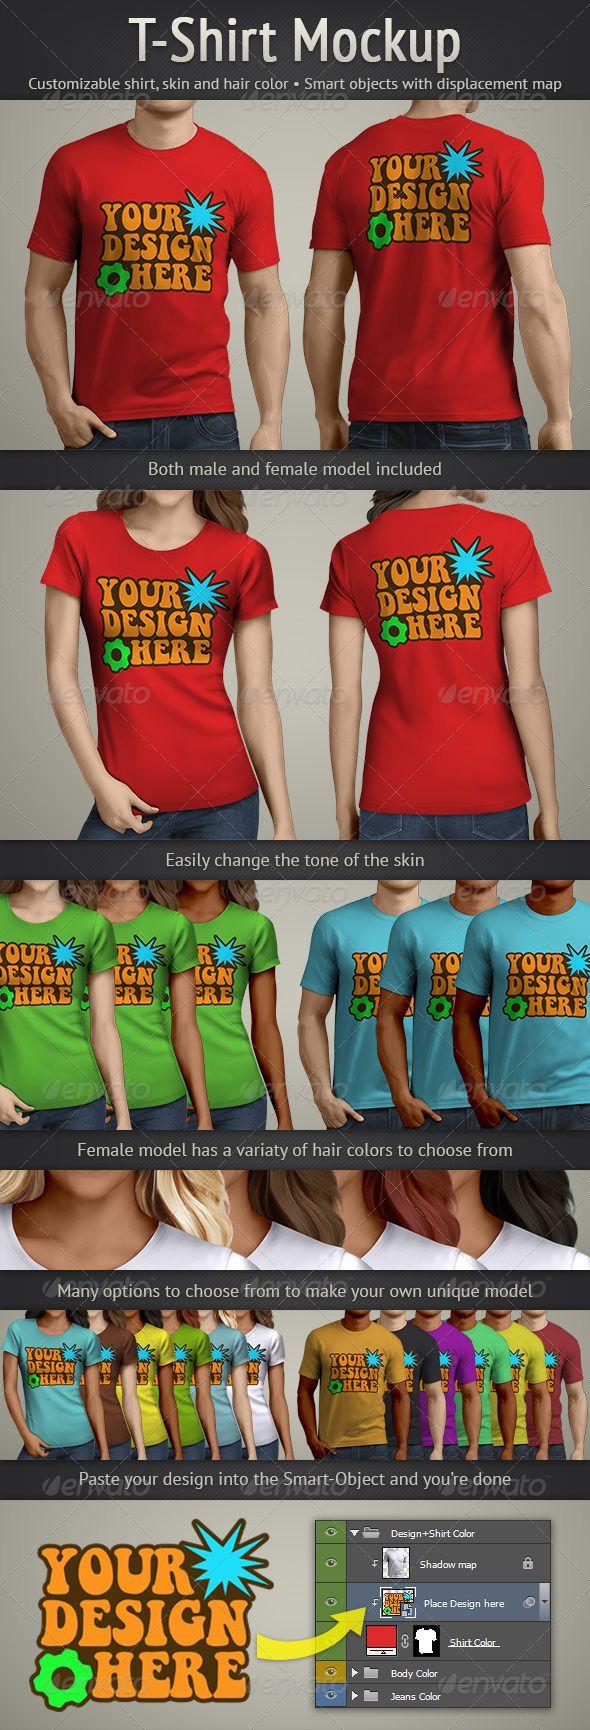 Scalable t shirt mockups more info - T Shirt Mockup